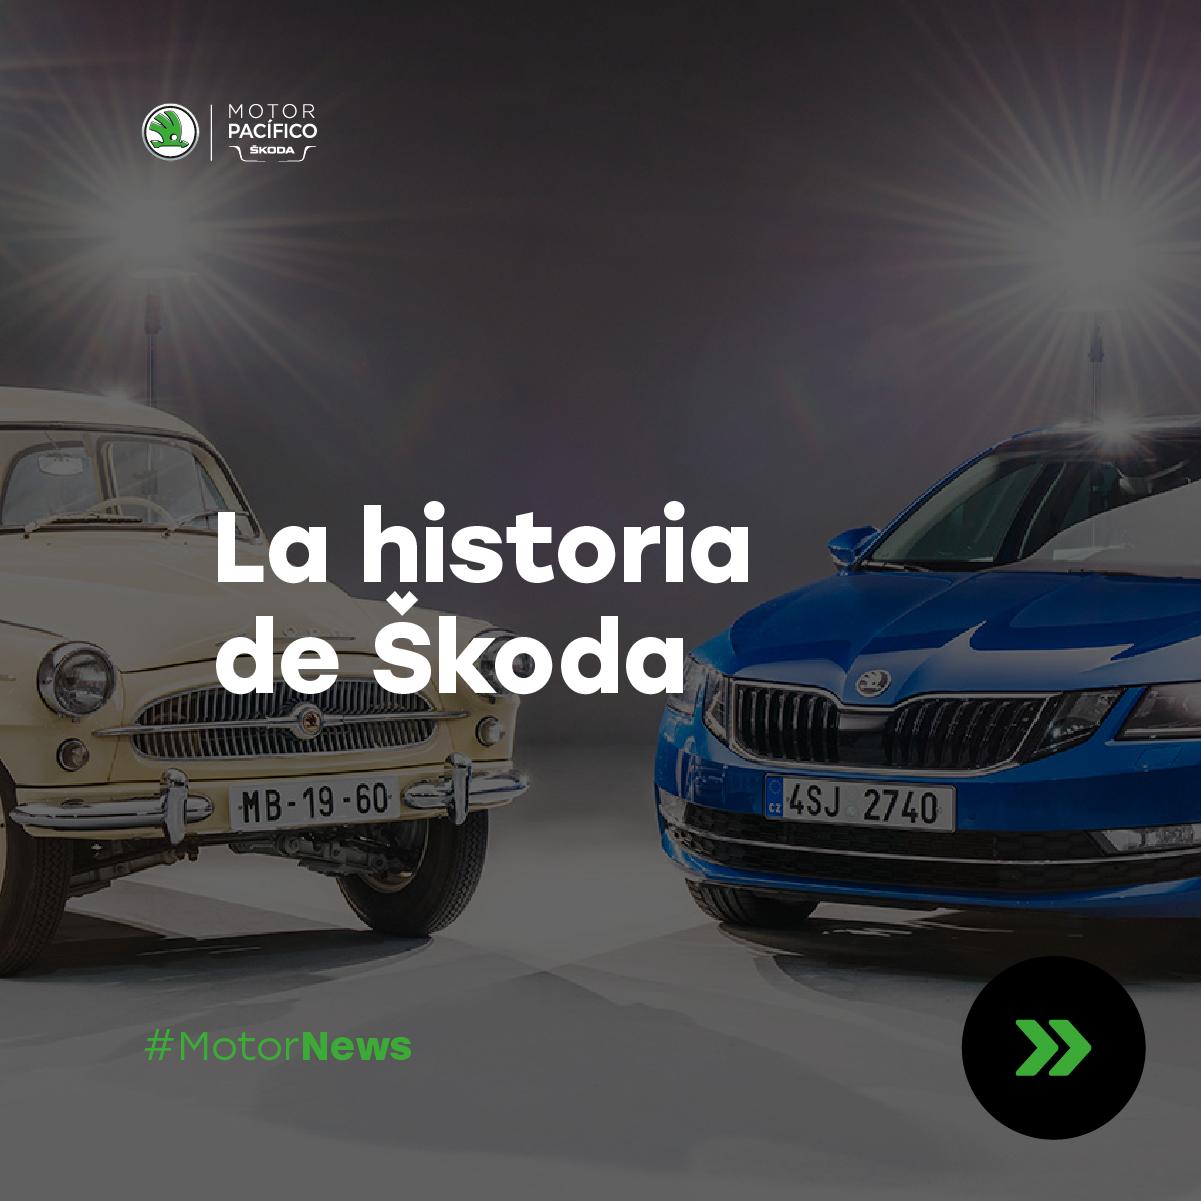 La historia de Skoda